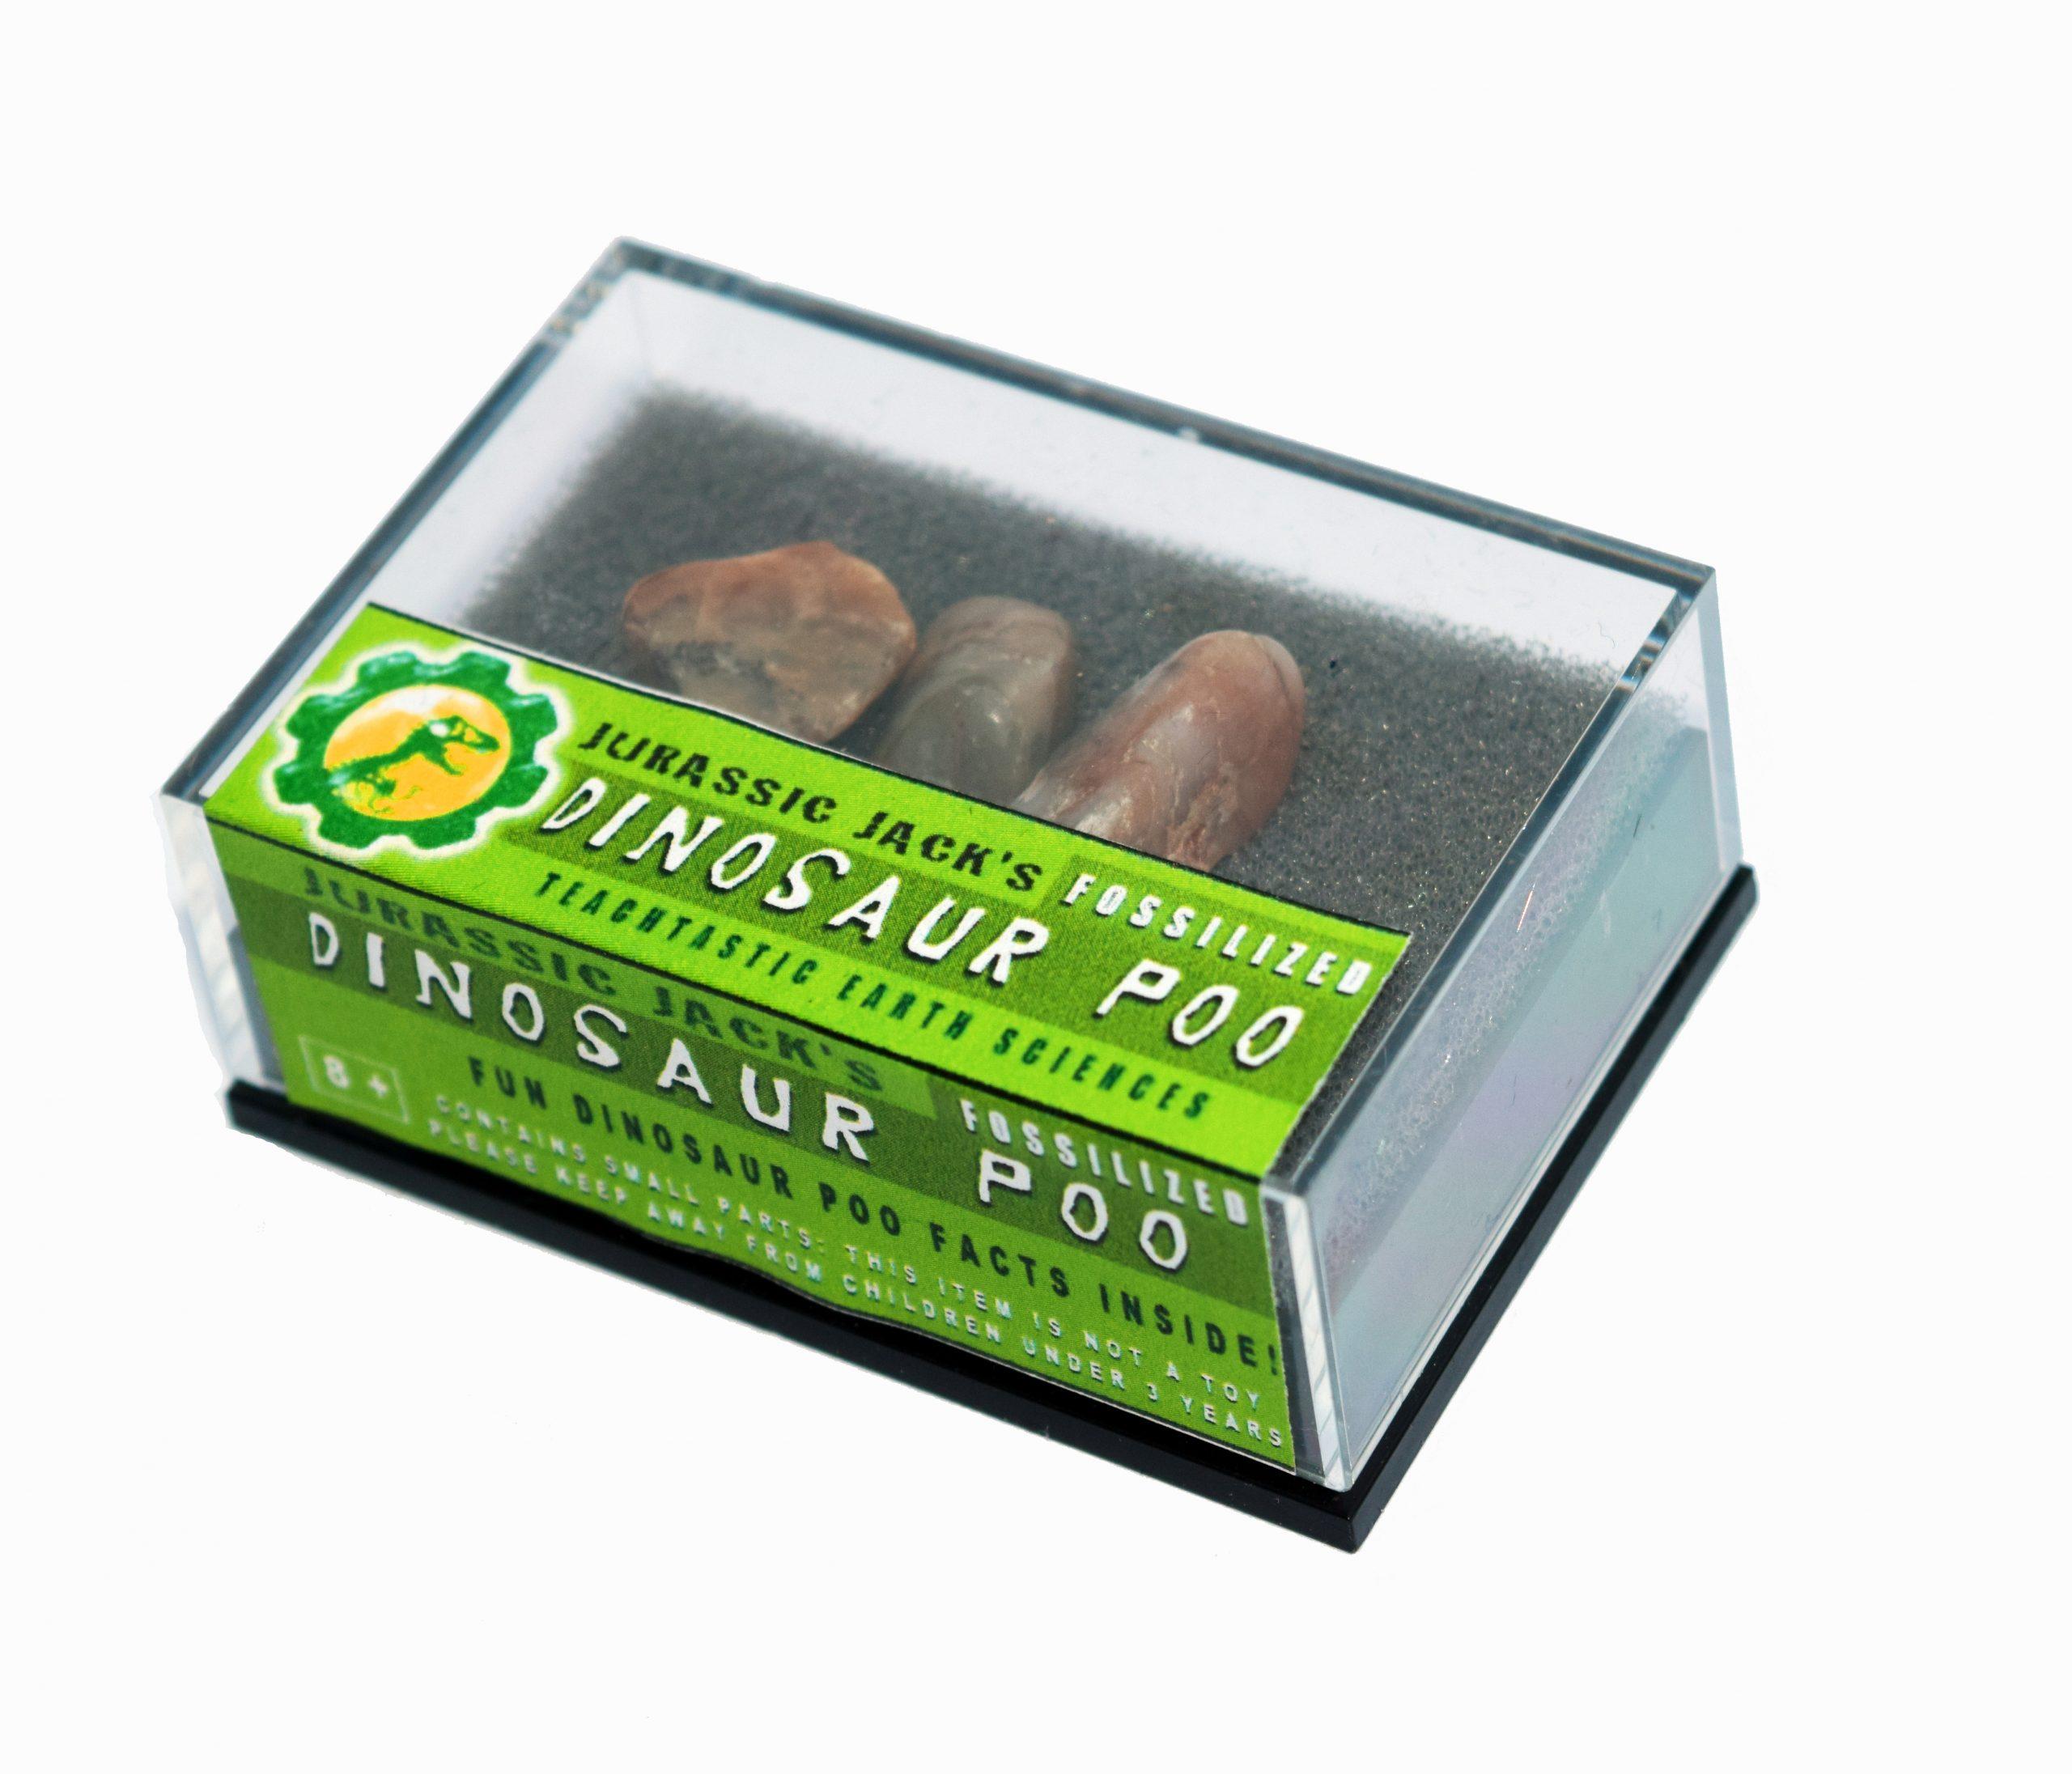 jurassic jacks dinosaur poo box collection